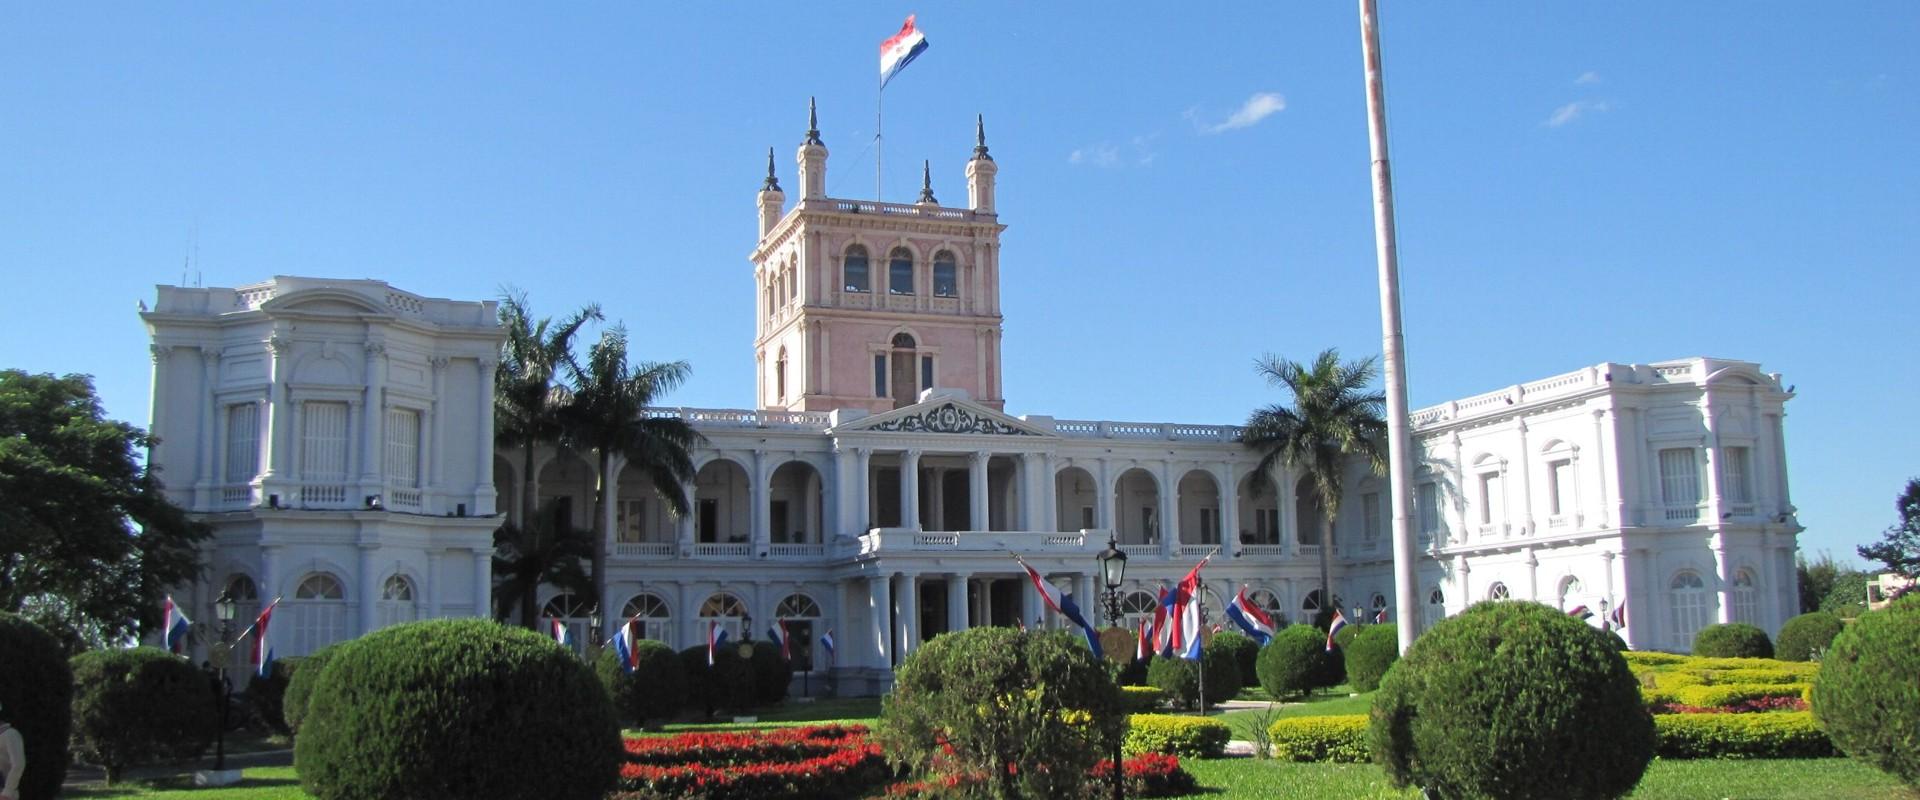 Paraguay Inmigration Services